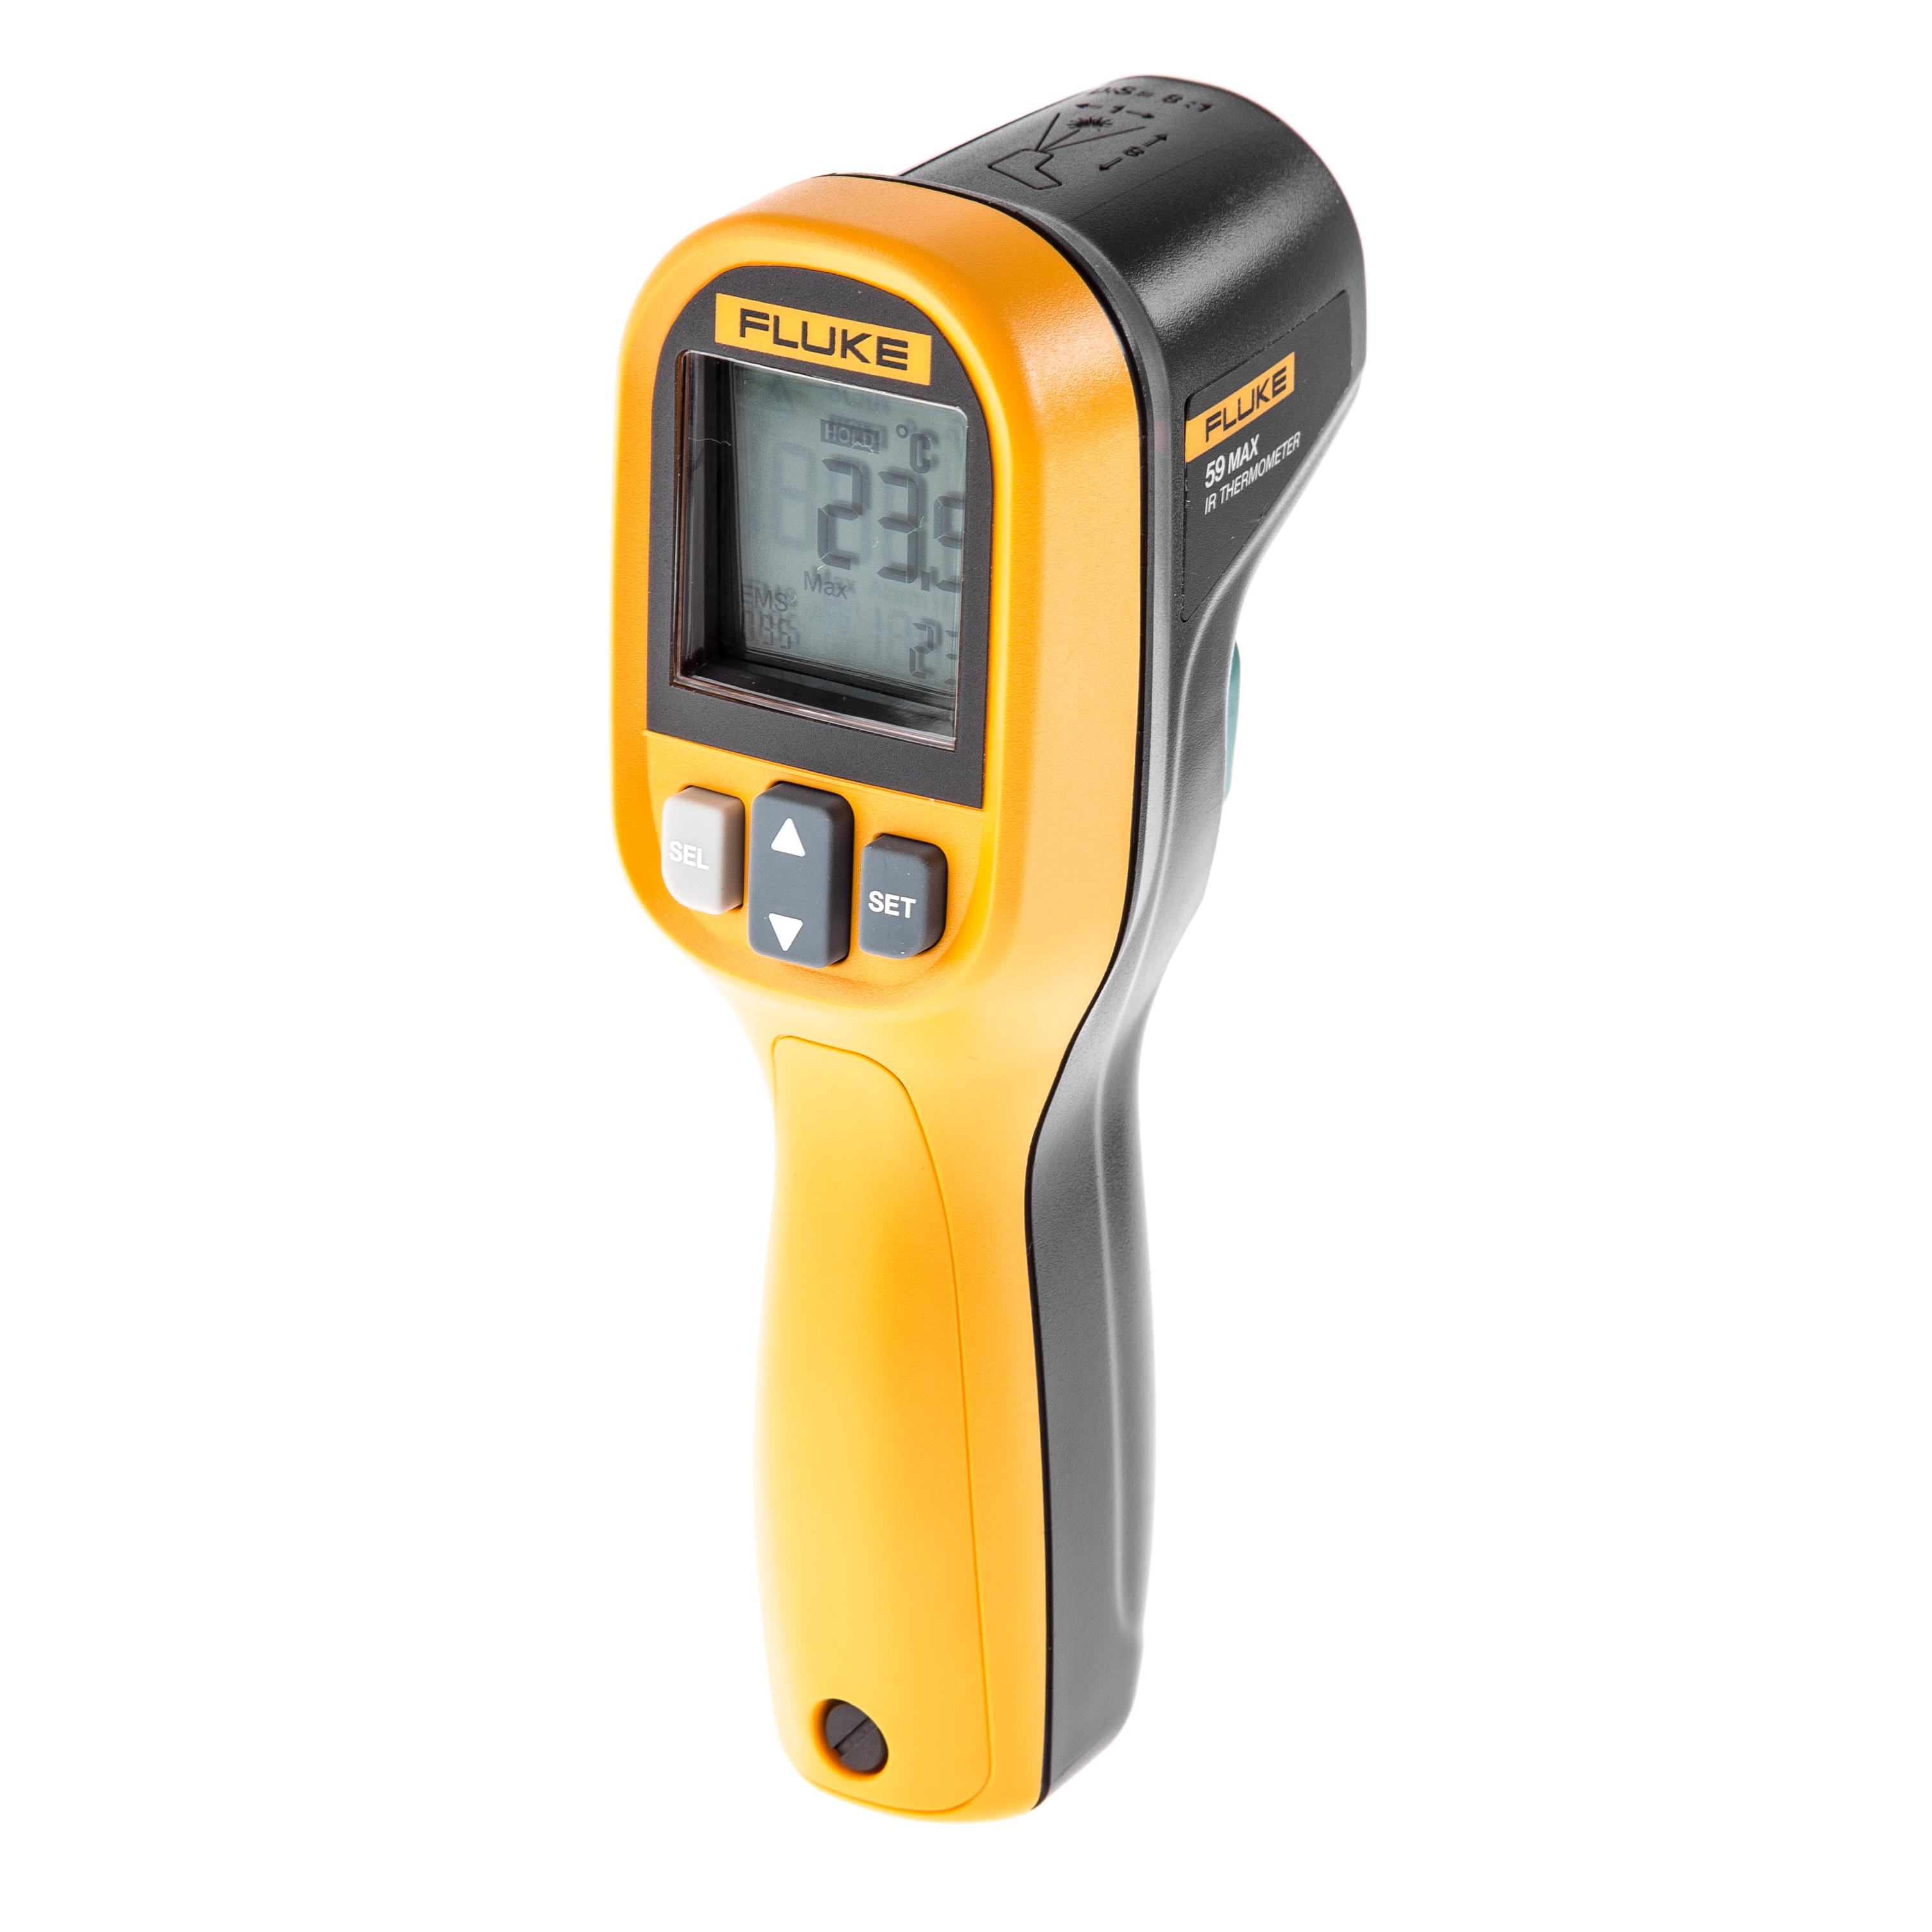 Пирометр (термодетектор) Fluke 59 max